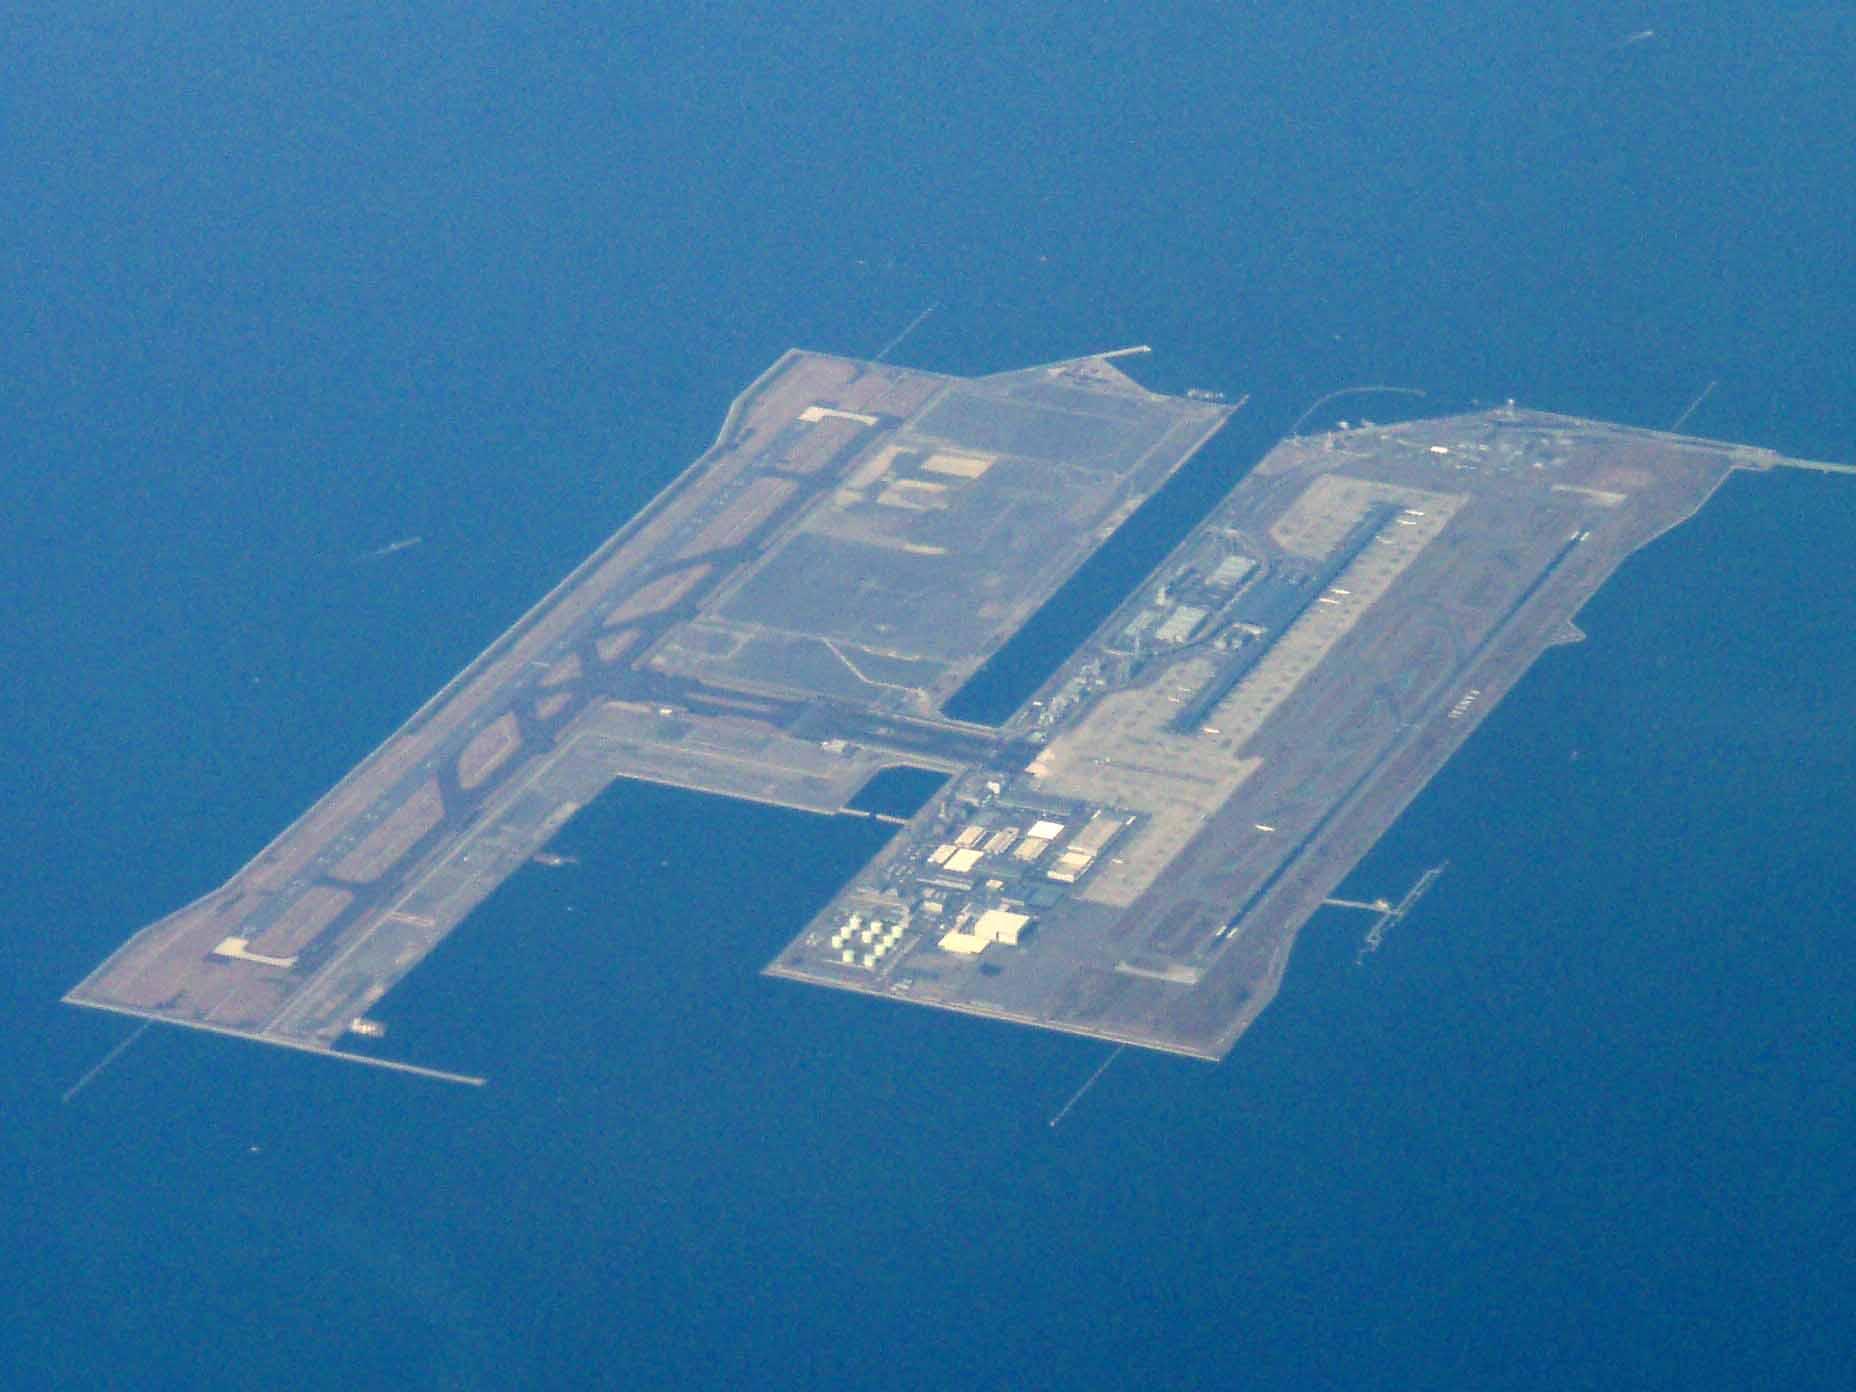 Depiction of Aeropuerto Internacional de Kansai